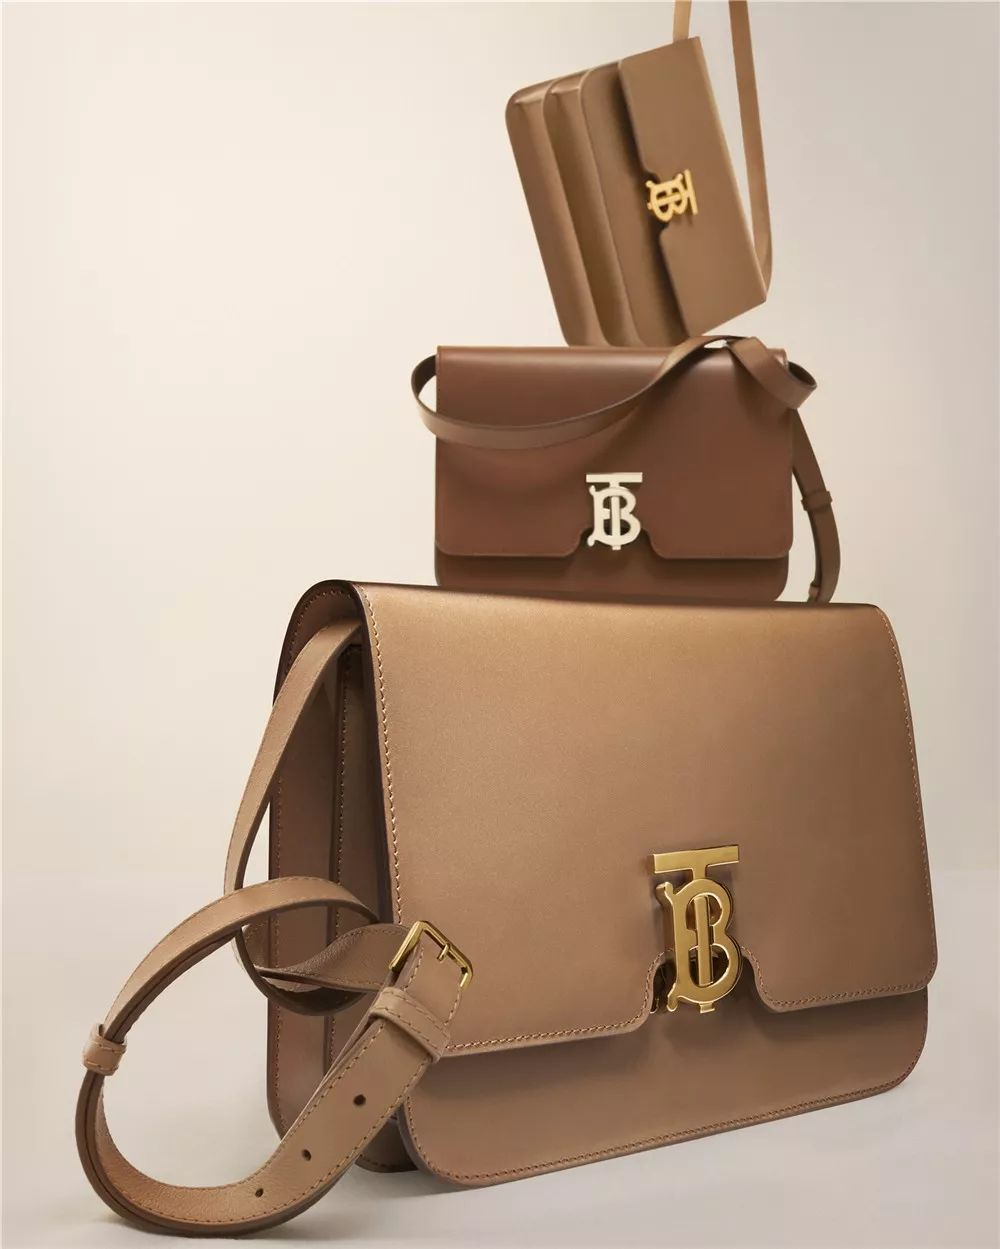 burberry的新包怎么背好看 赵薇 周冬雨 宋威龙 窦骁告诉你